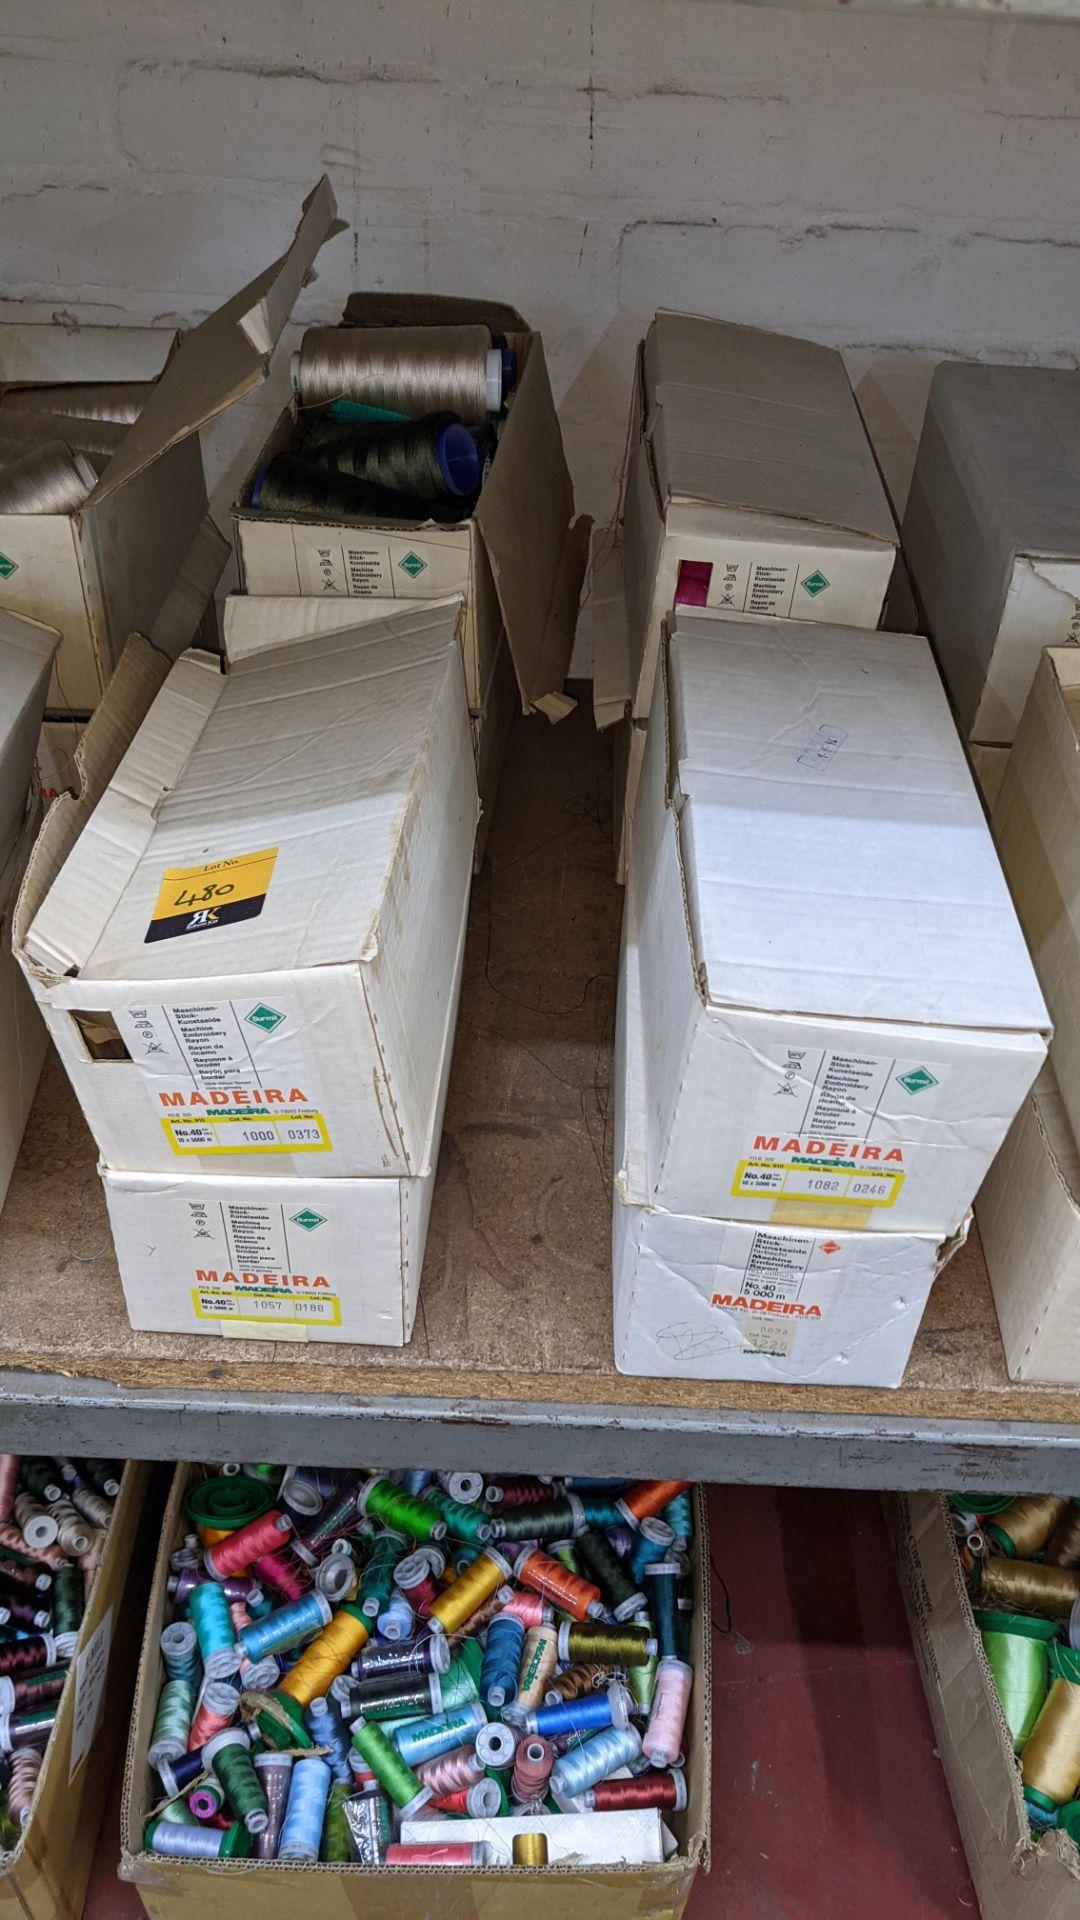 8 boxes of Madeira Burmit No. 40 rayon embroidery thread